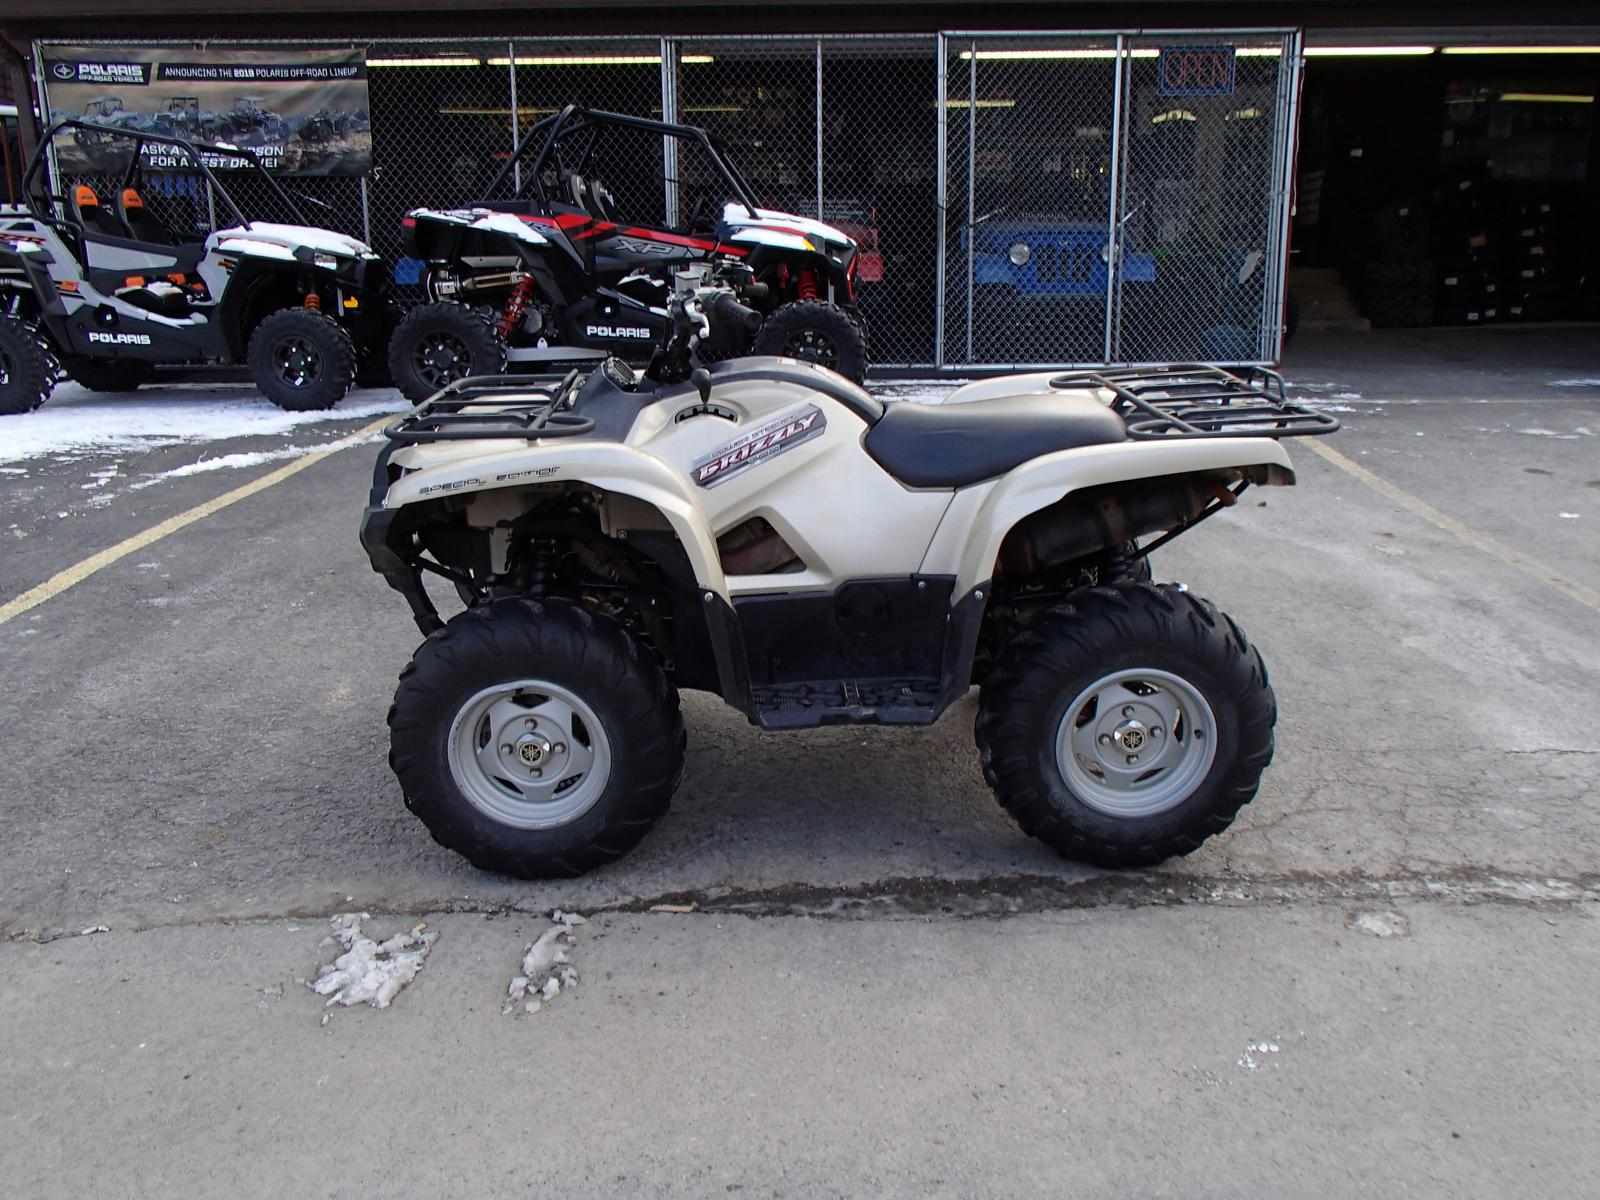 2012 Yamaha Grizzly 700 EPS